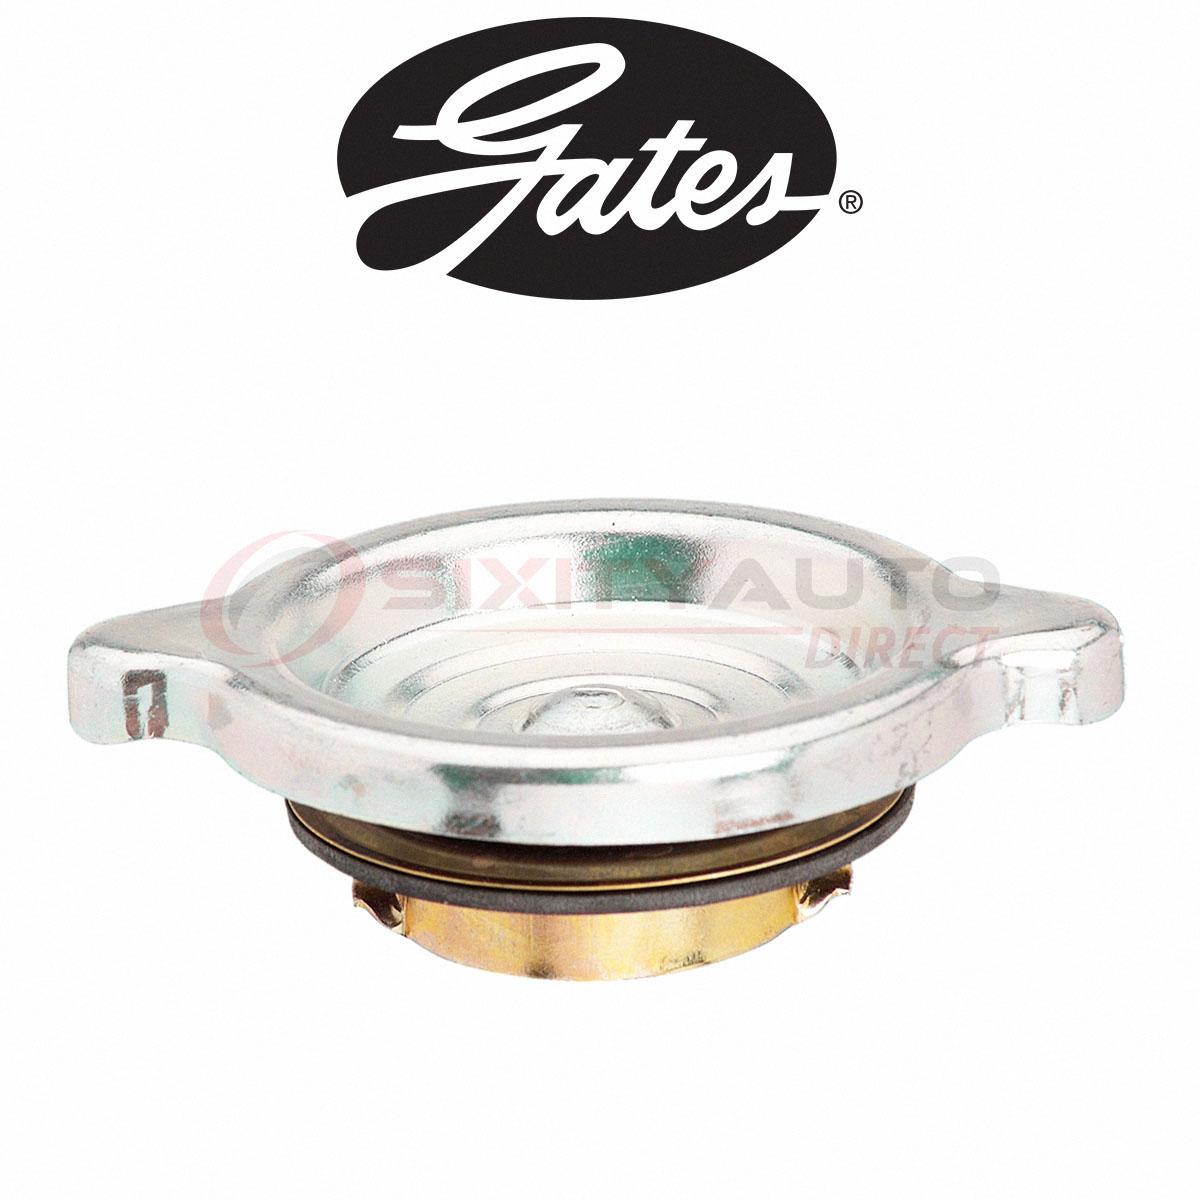 Gates Oil Filler Cap for 1970-1981 Chrysler Newport 7.2L 5.9L 5.2L 6.3L 6.6L mb